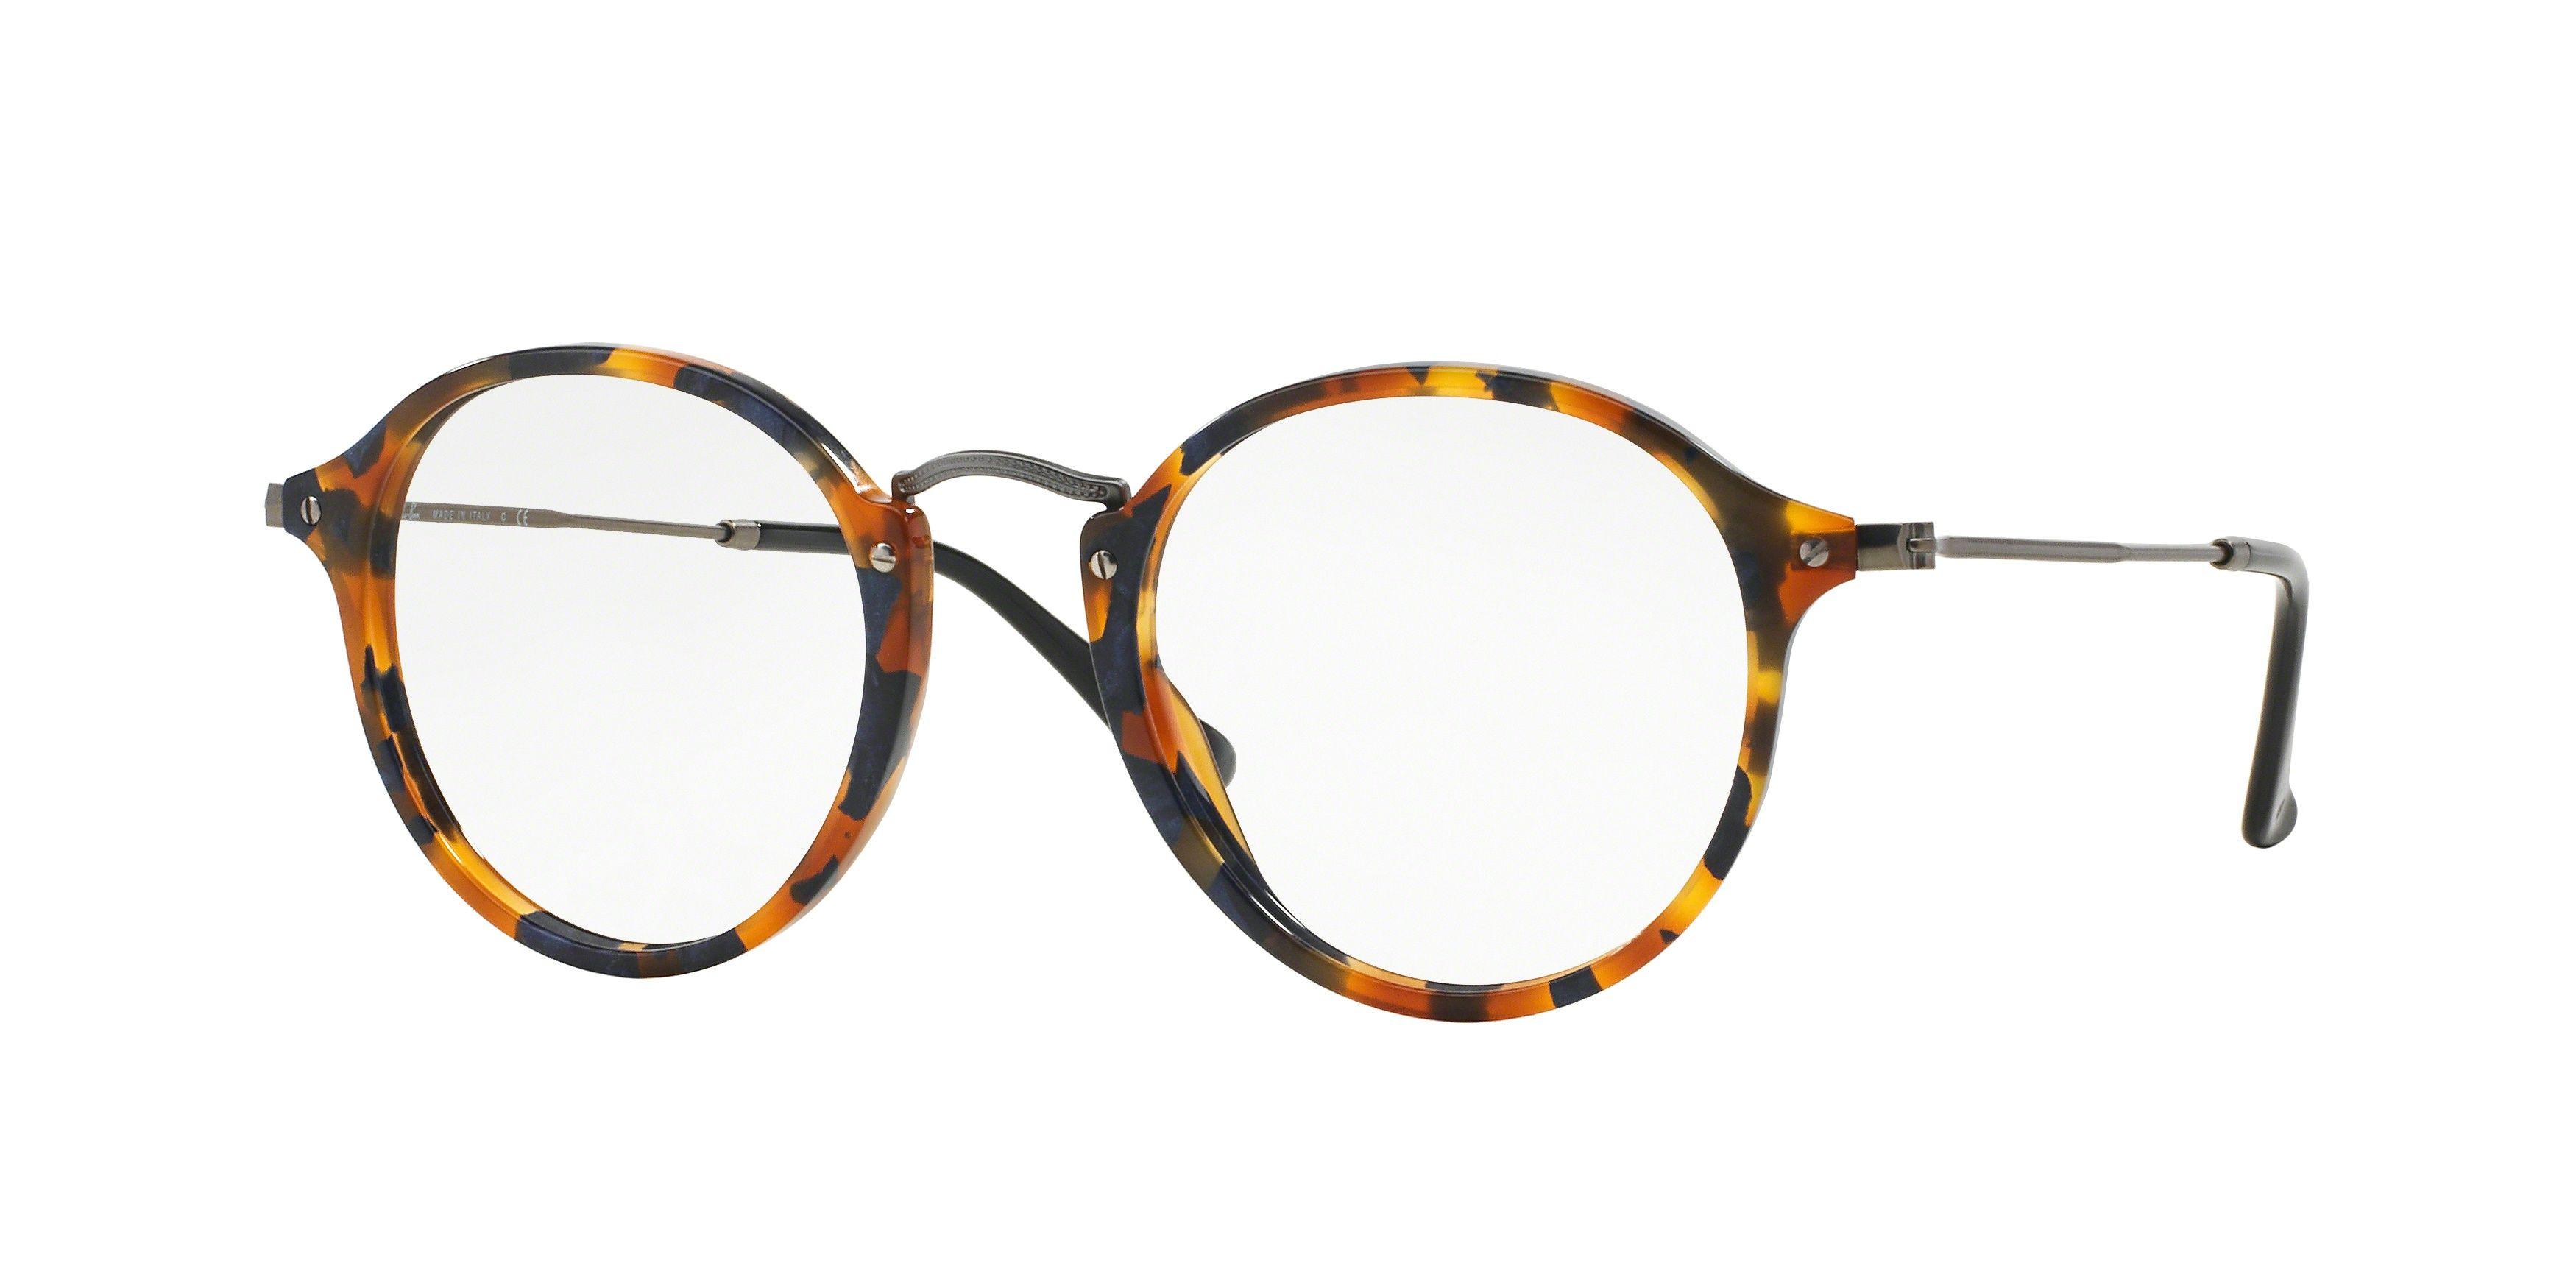 Afficher l image d origine   GLASSES   Pinterest   Eyeglasses ... 6dcb267ccce3